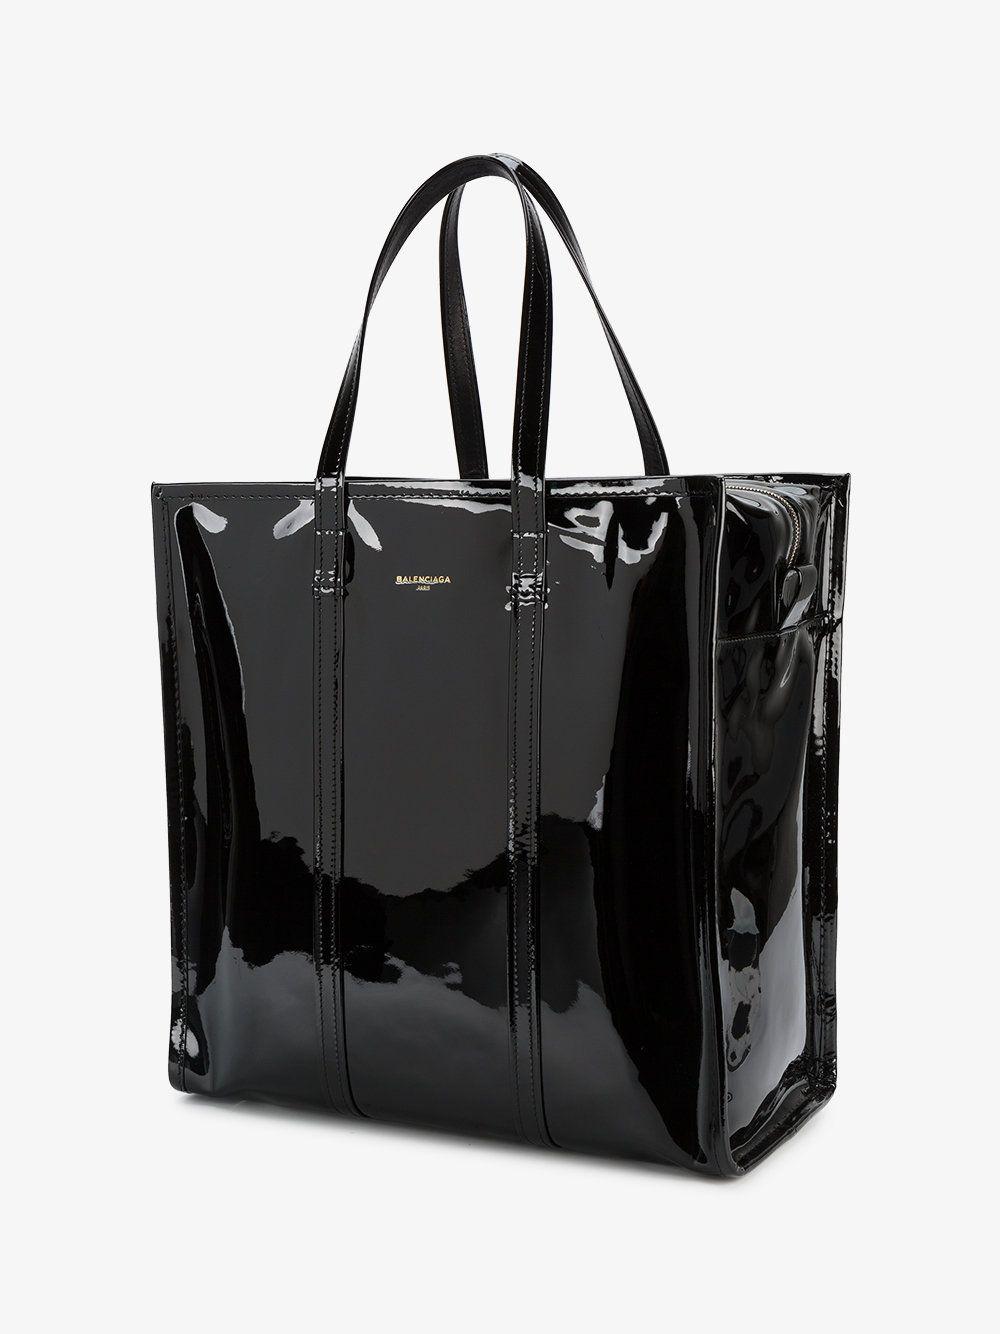 209a02bcd Black Bazar Shopper Patent Leather Tote Bag | ღ Love Bag ღ ...